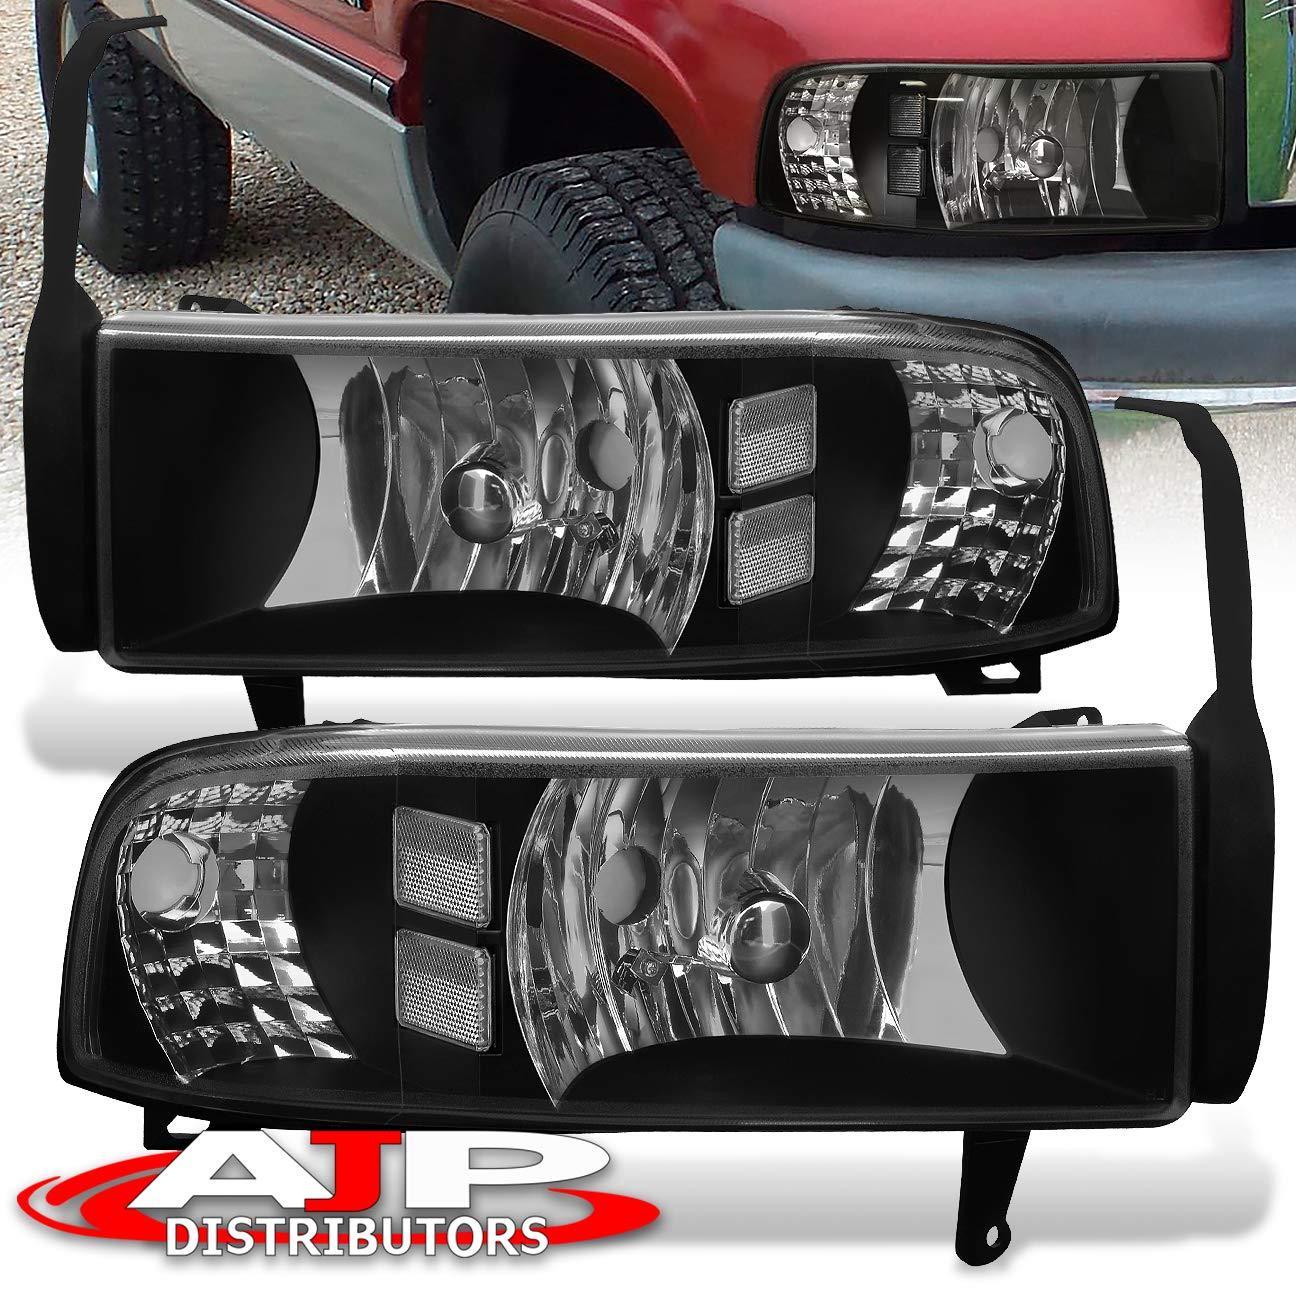 AJP Distributors Headlights Lights Lamps For Dodge Ram 1500 2500 3500 1994 1995 1996 1997 1998 1999 2000 2001 2002 94 95 96 97 98 99 00 01 02 (Black Housing Clear Lens Clear Reflector)